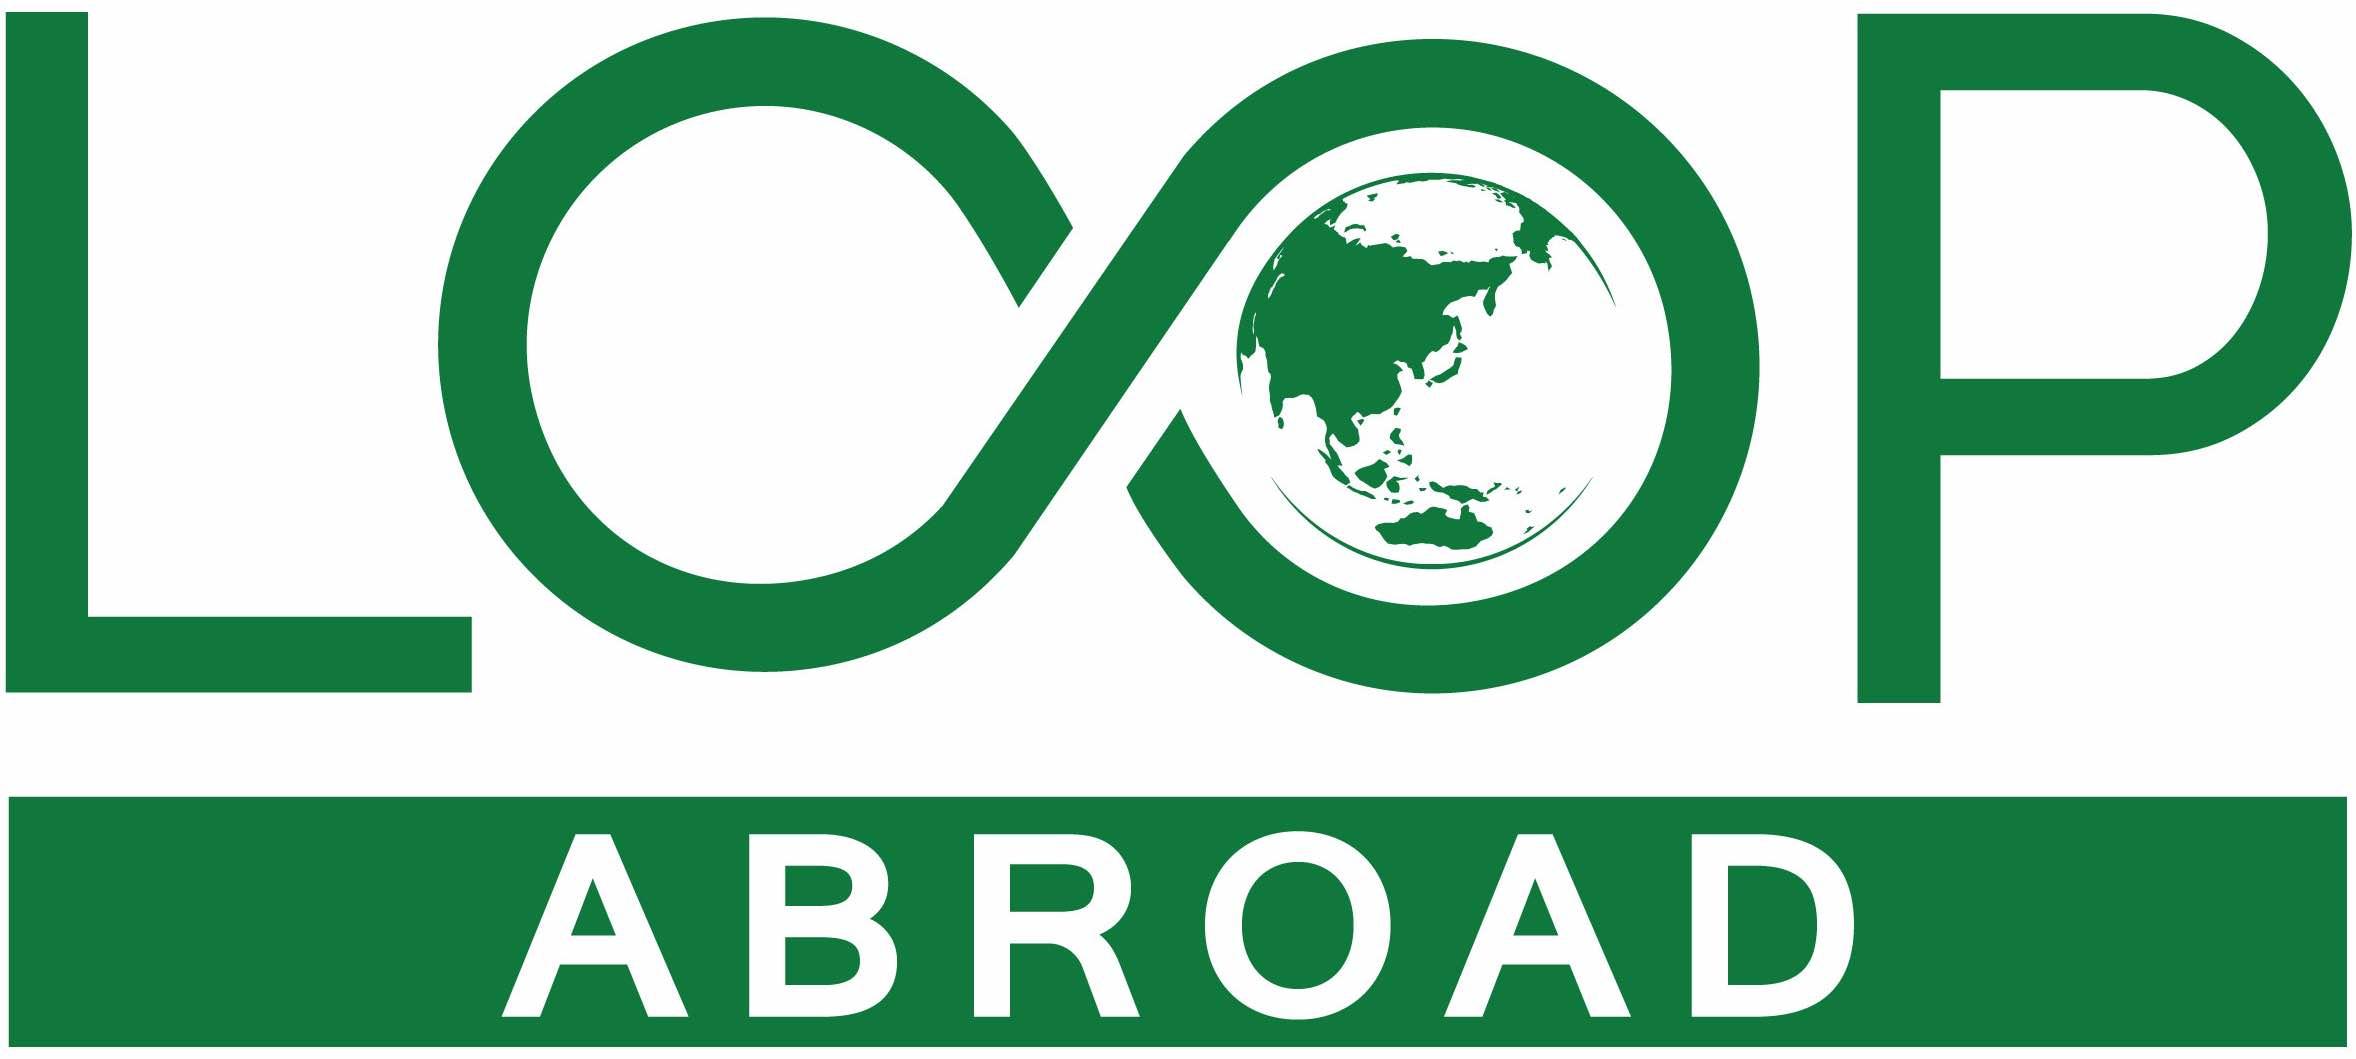 Loop Abroad: High School Veterinary Service